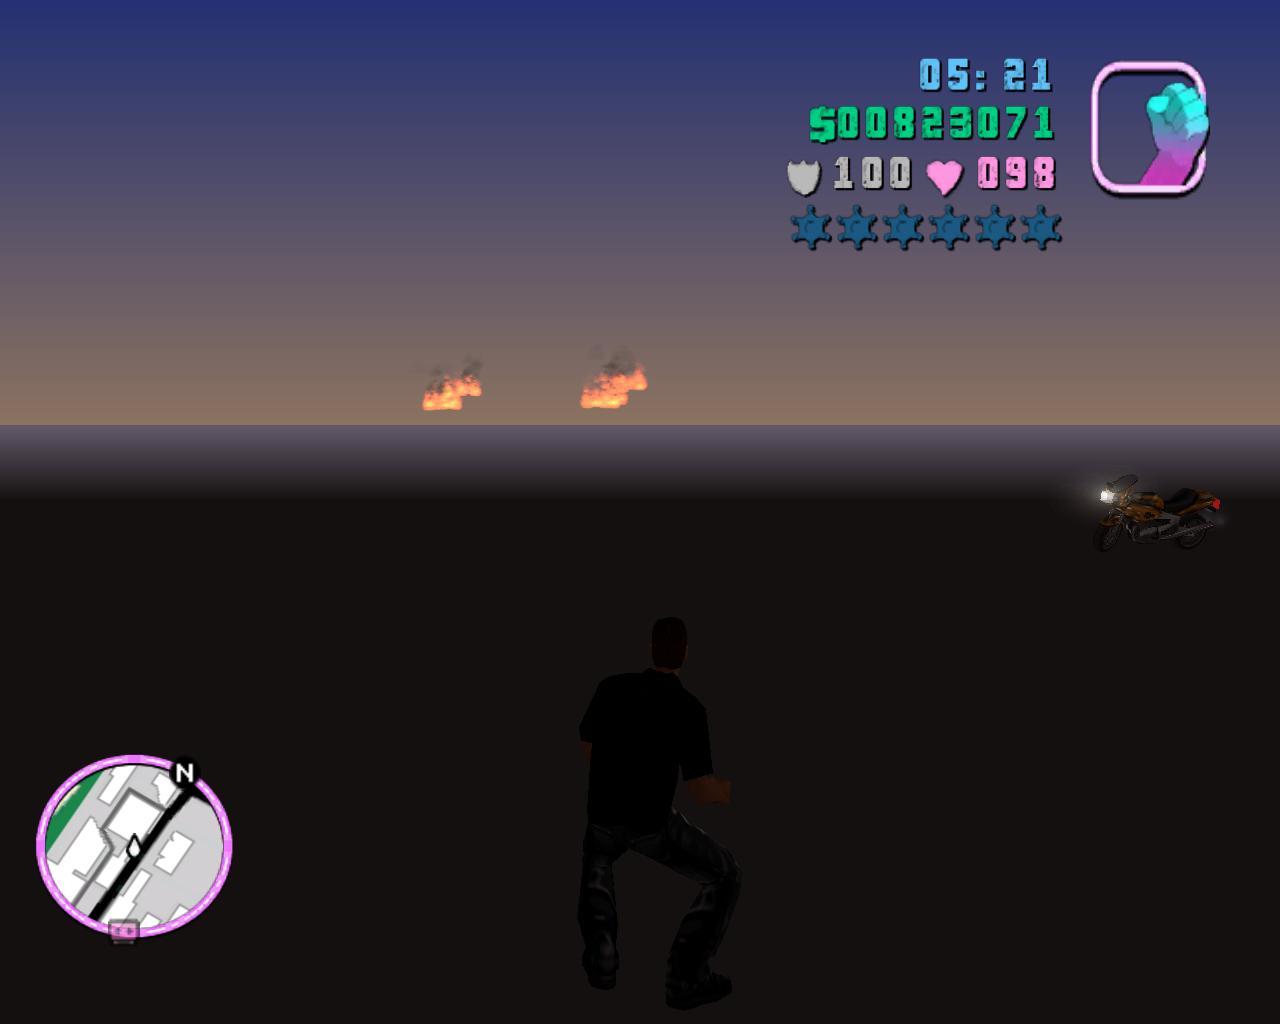 Глюк7 - Grand Theft Auto: Vice City Баг